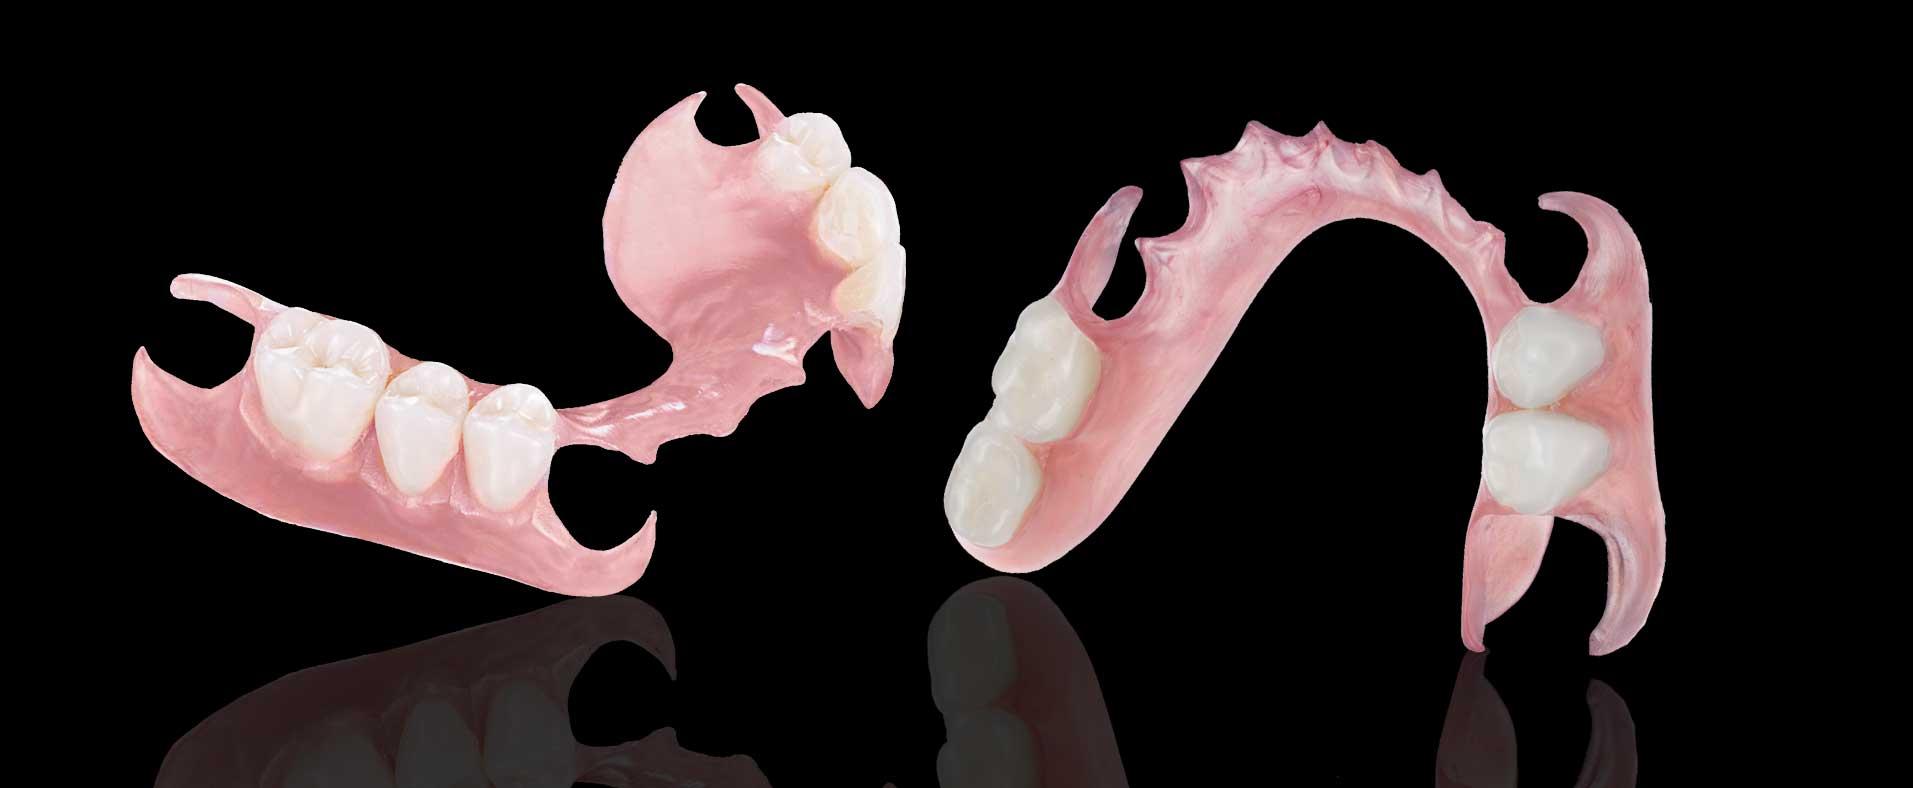 valpast partial denture